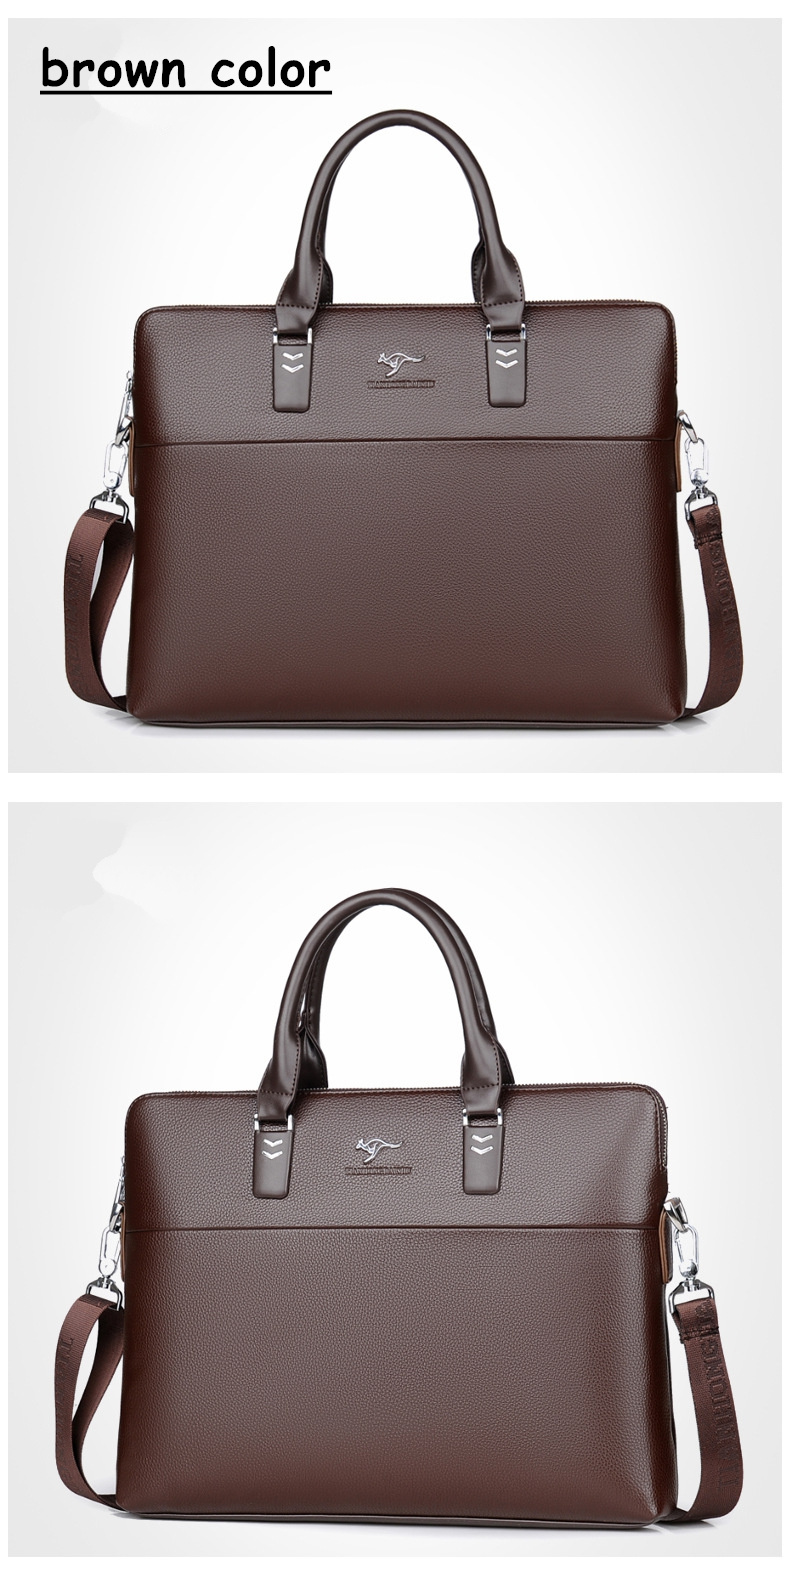 HTB10zsRgDwKL1JjSZFgq6z6aVXaU TIANHONGDAISHU Men Casual Briefcase Business Shoulder Leather Messenger Bags Computer Laptop Handbag Men's Travel Bags handbags